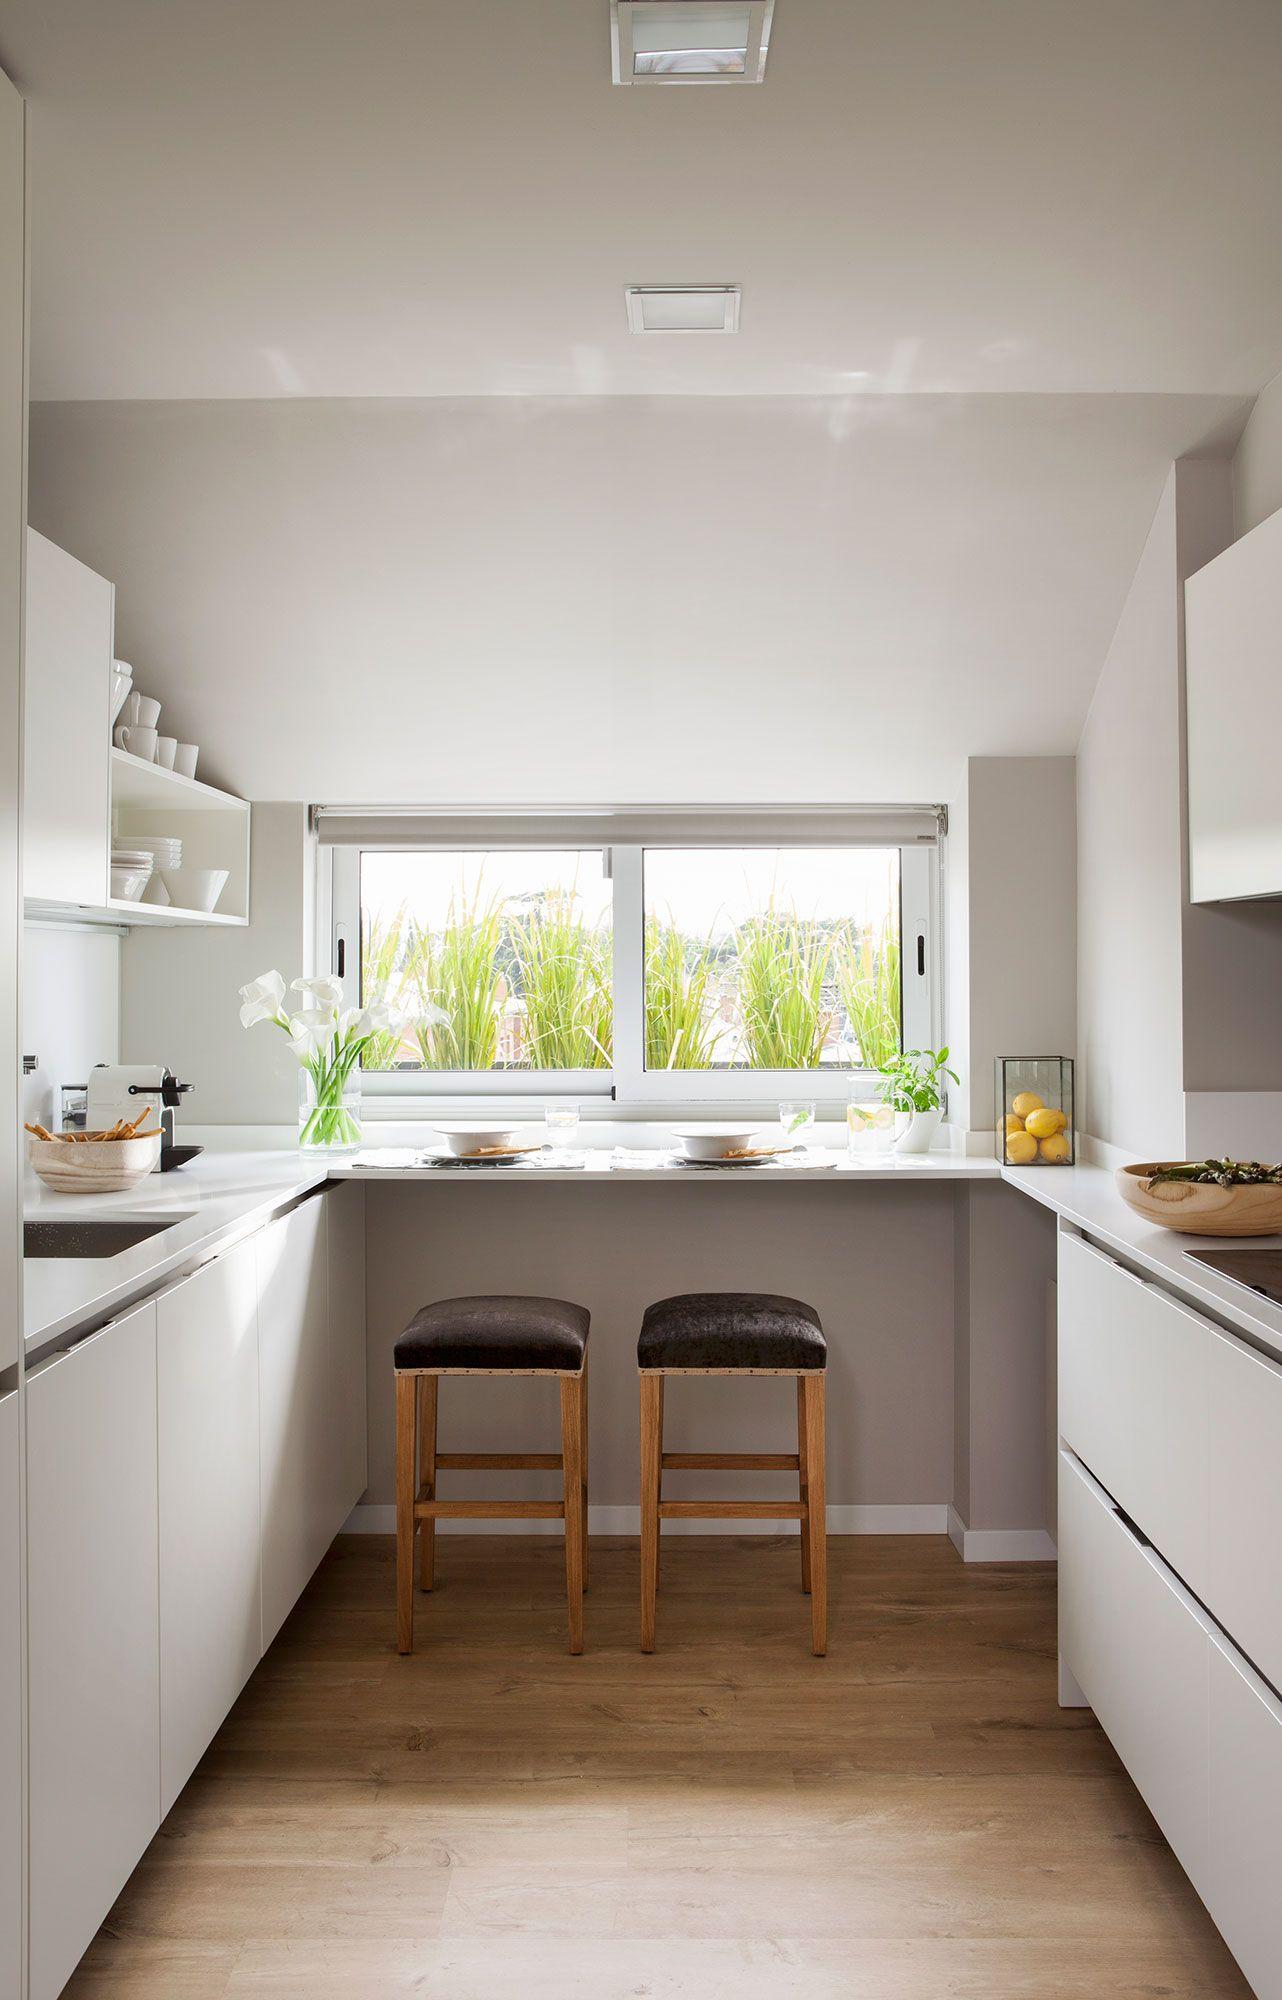 Cocina peque a blanca en u con peque a barra de for Decoracion cocinas blancas pequenas